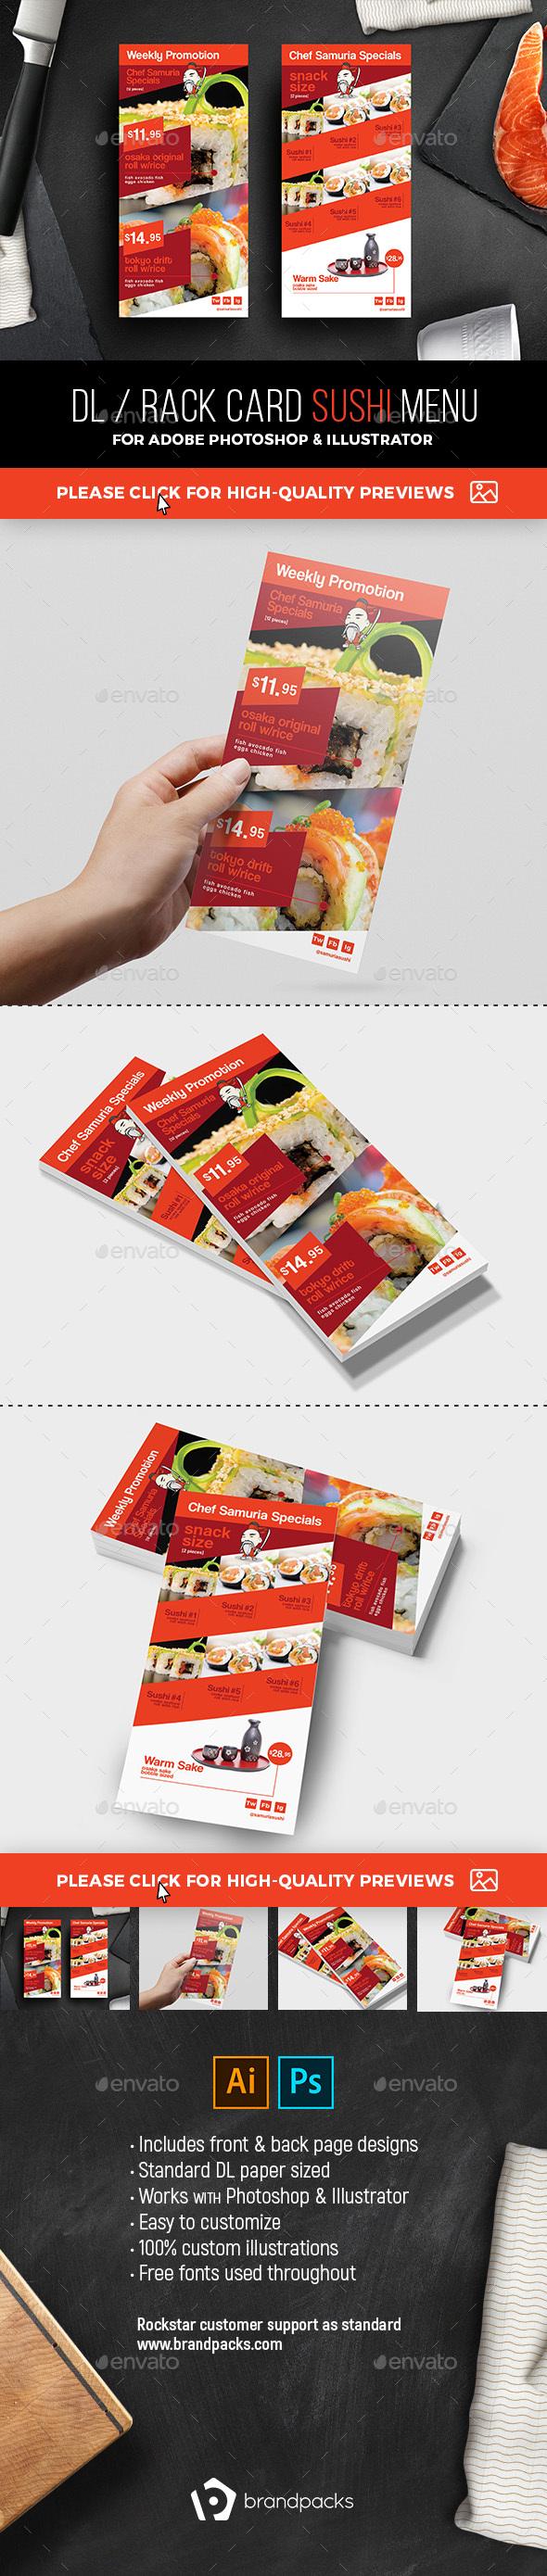 GraphicRiver DL Sushi Menu Template 21105969